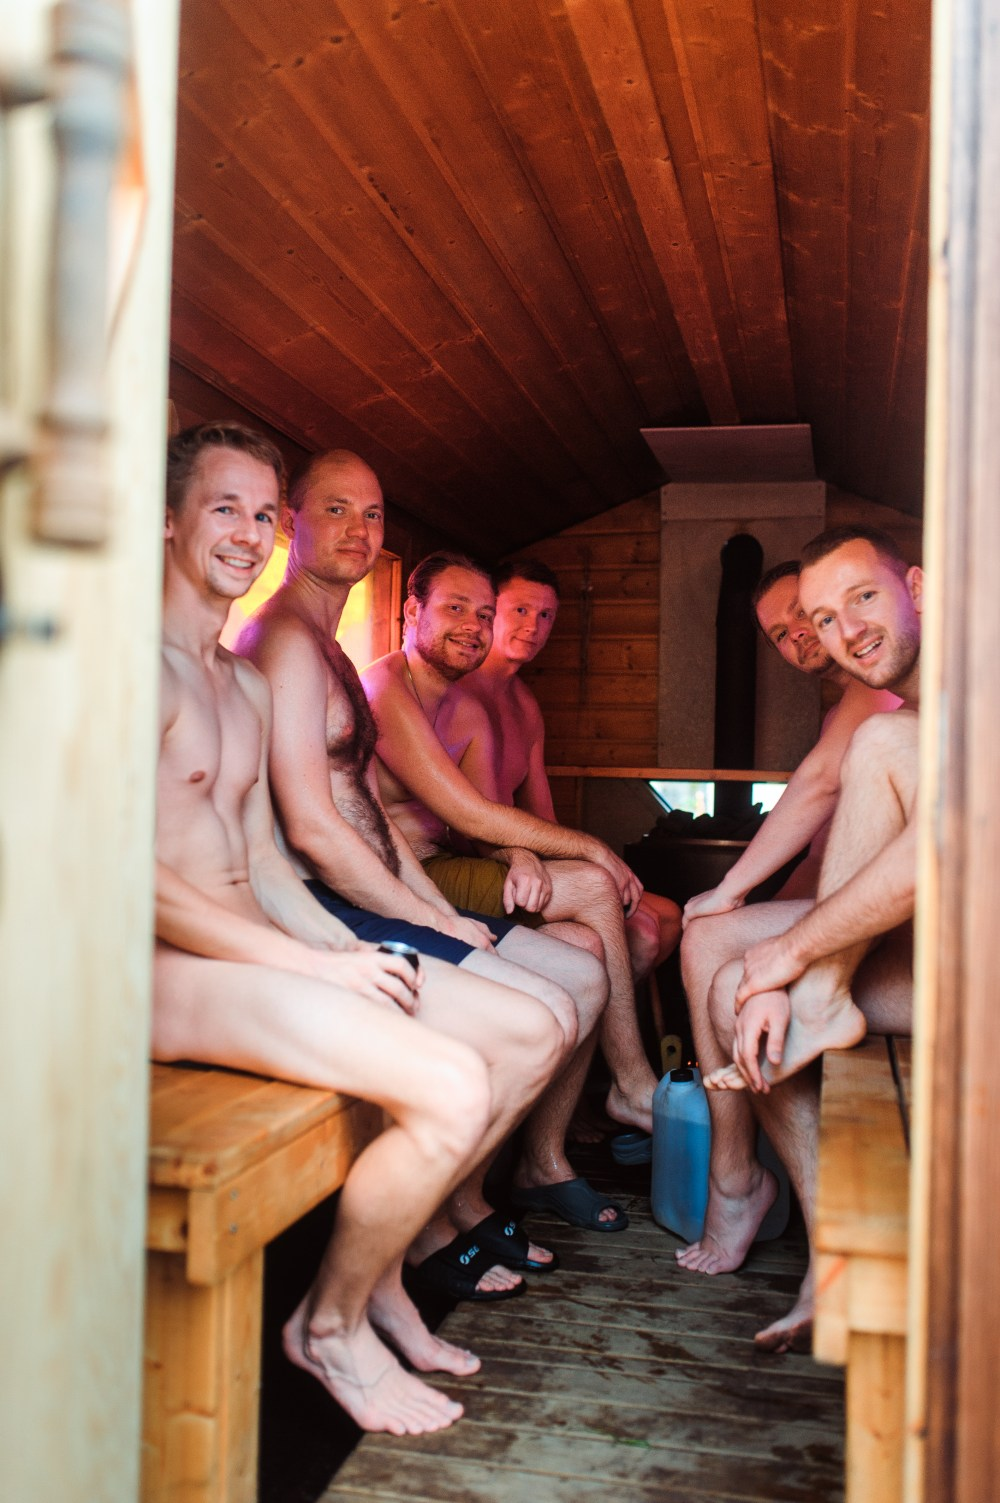 Helsinki_Sauna_Day-2016_10_29-027_6571